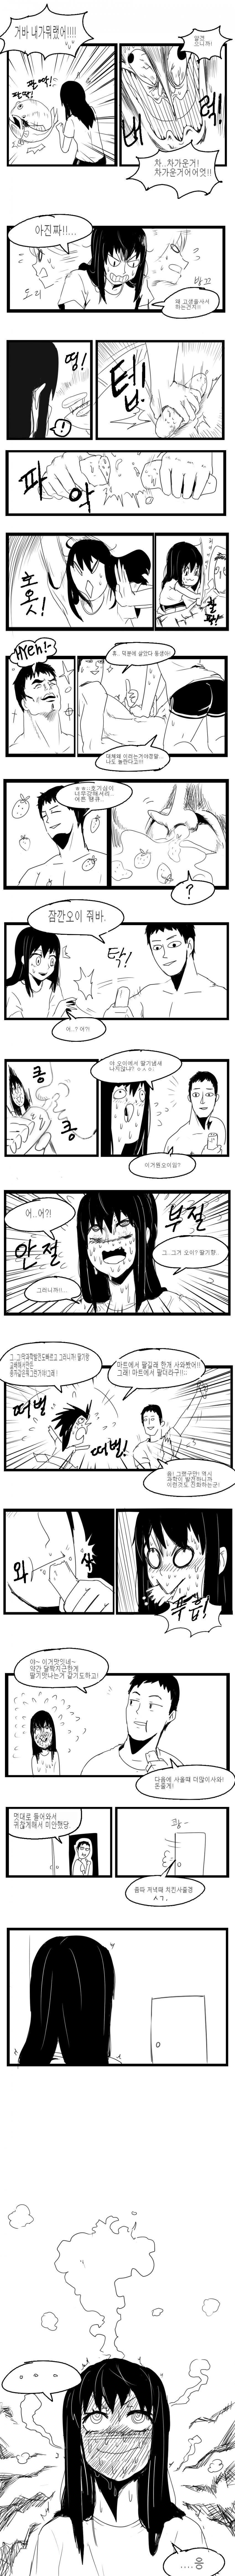 3.jpg ㅇㅎ)우리 오빠는 호기심이 너무강해!!!